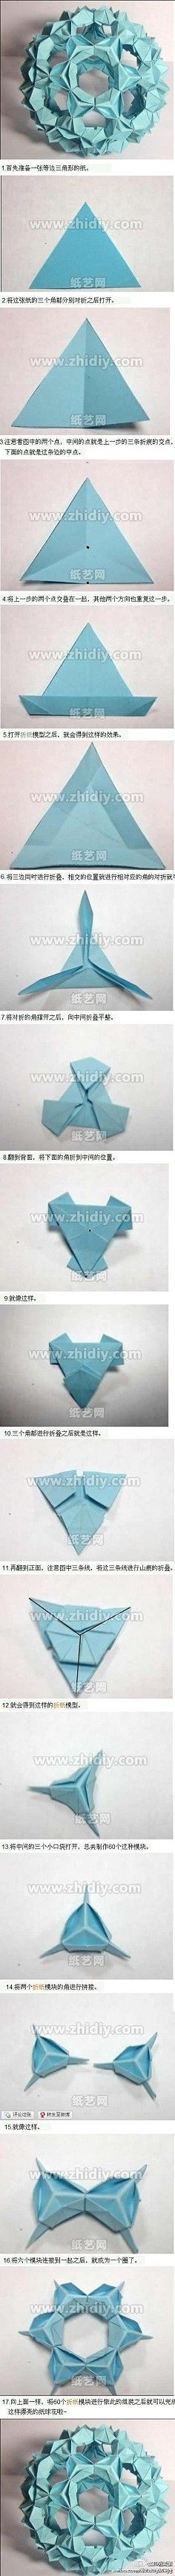 Blue Star paper origami flower ball tutorial